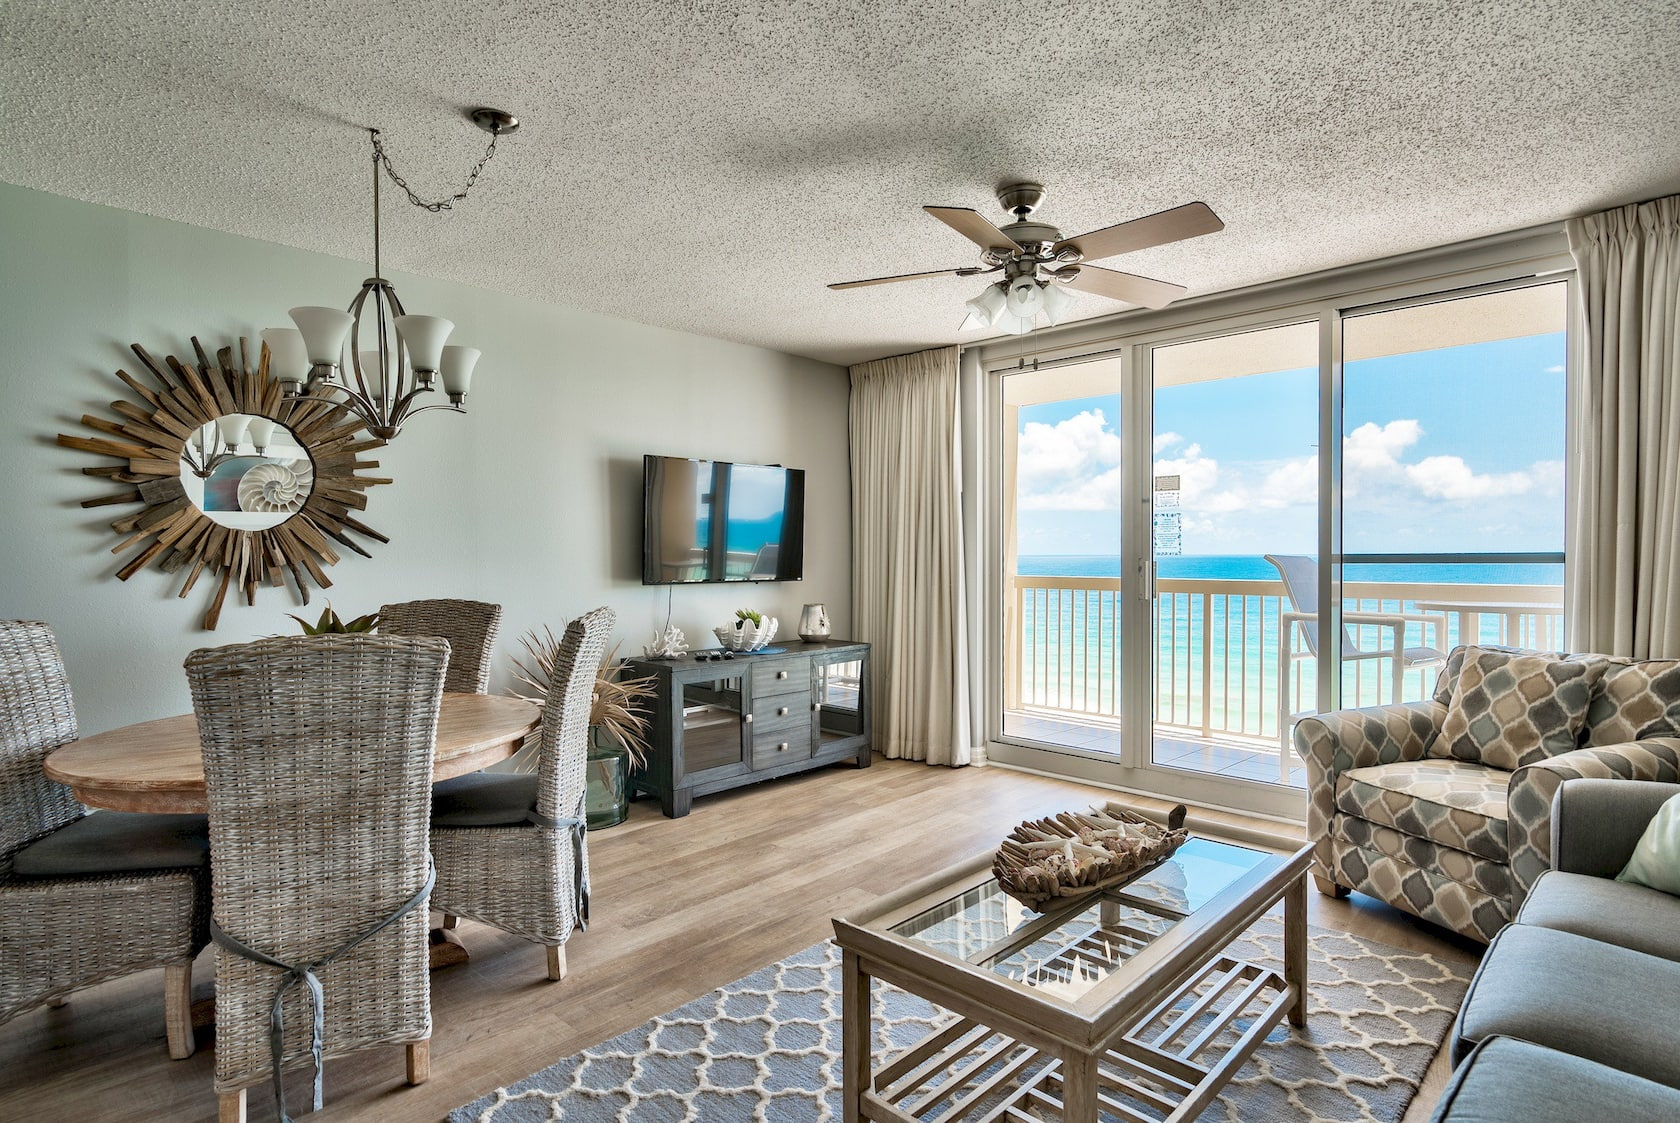 Airbnbs in Destin Florida